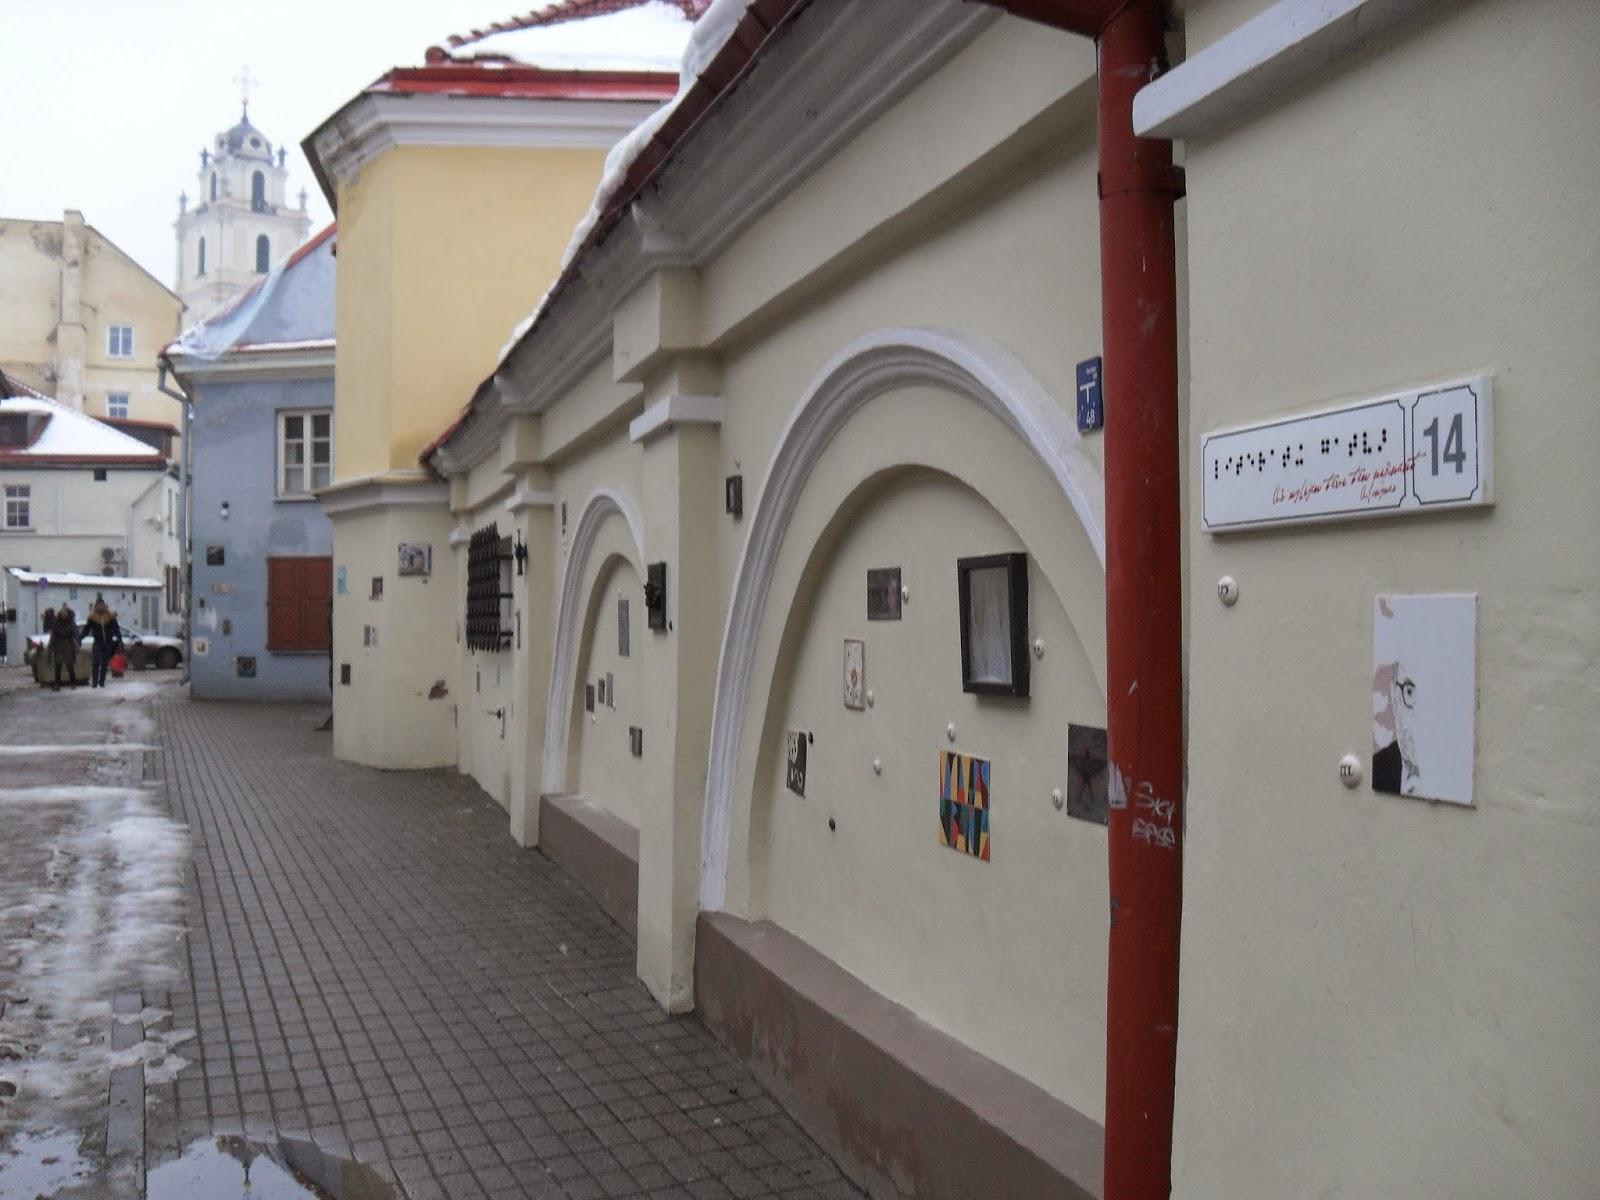 Calle de Vilnius